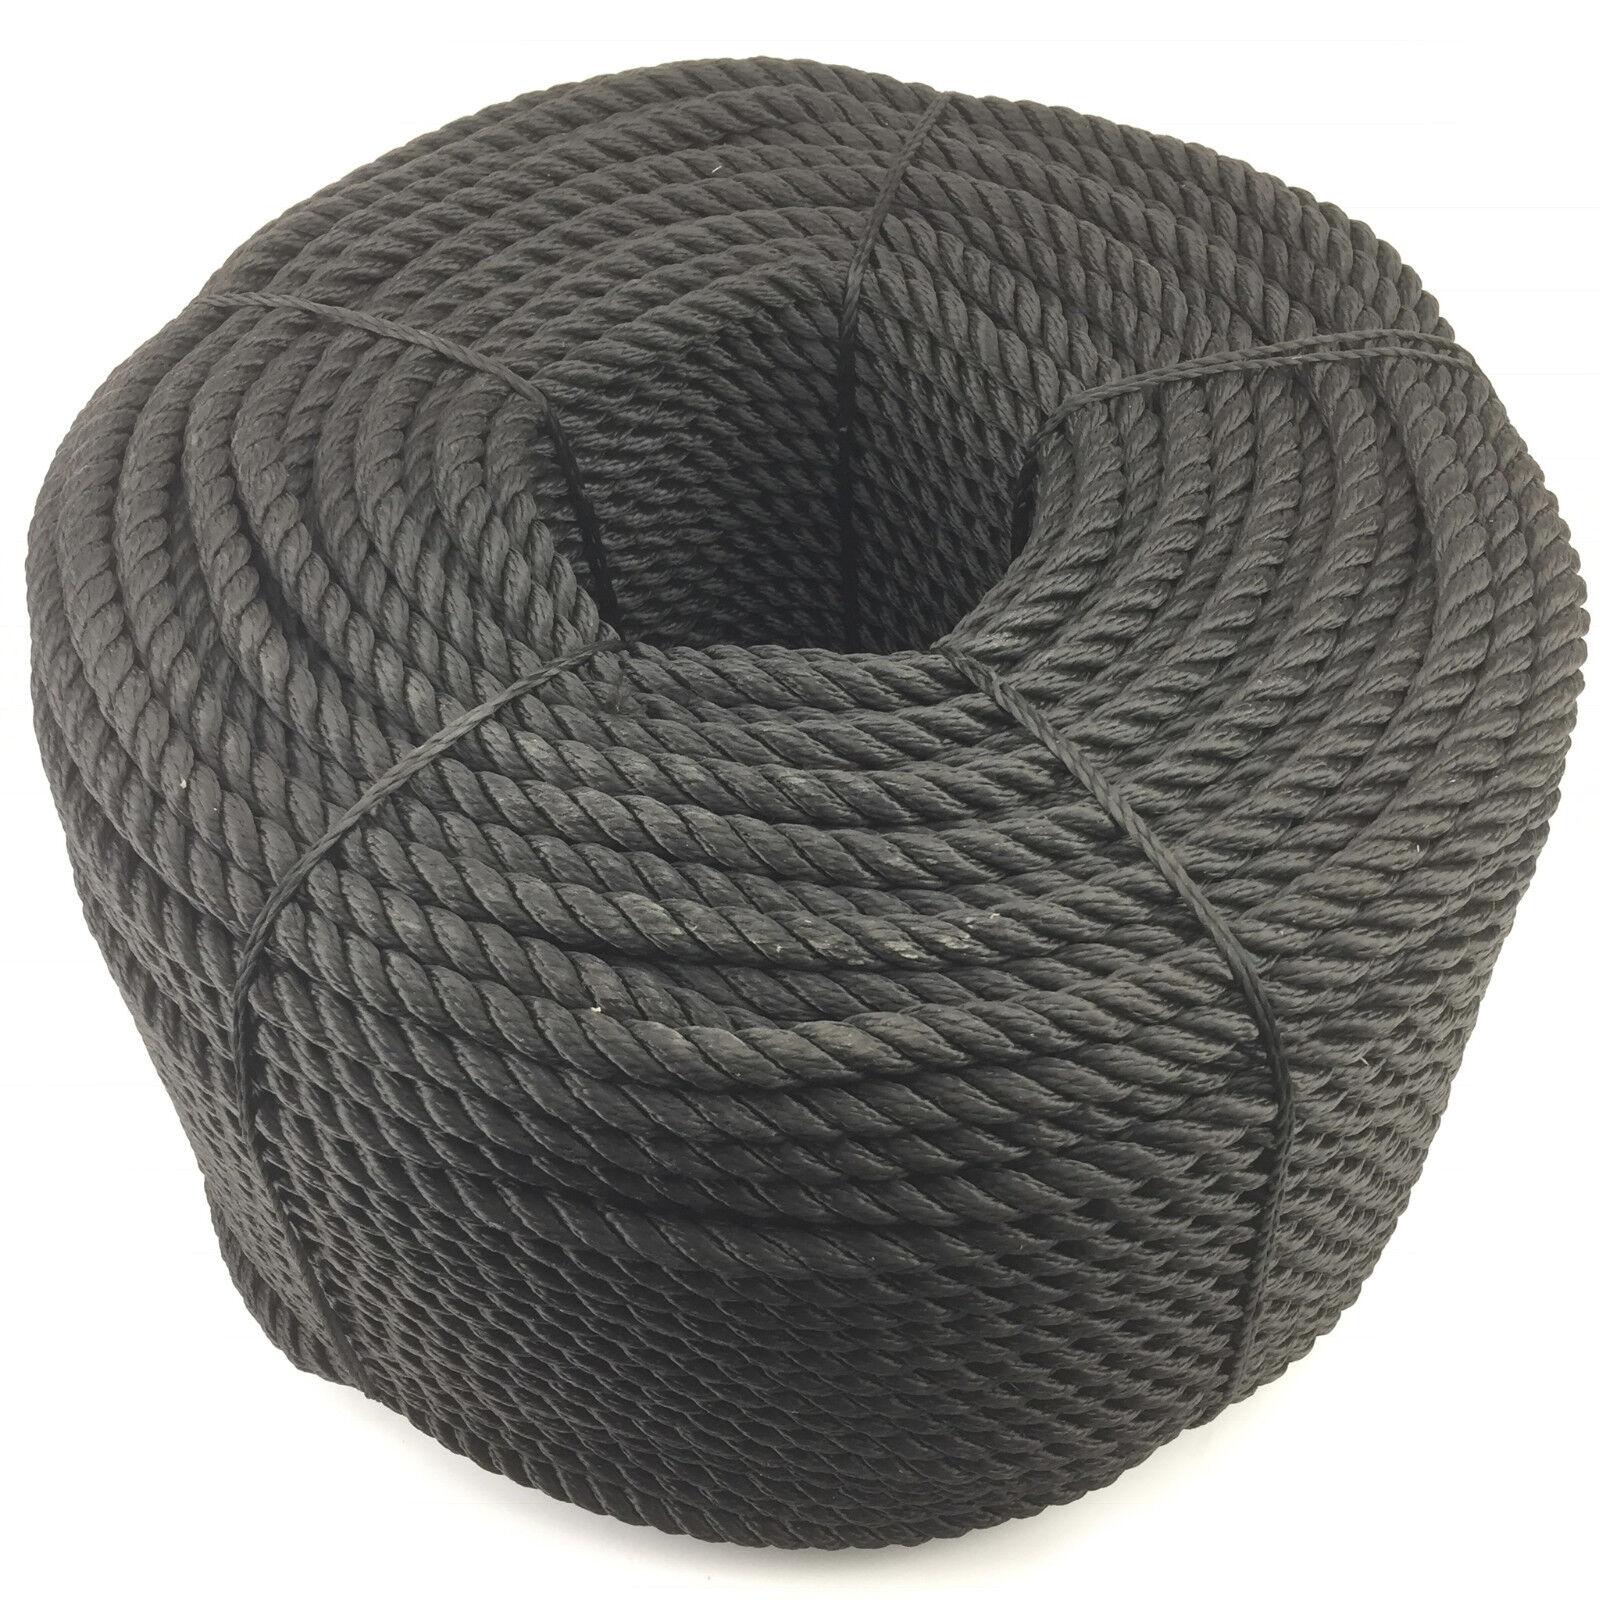 16mm Negro 3 filamentos Múltiple X 50 metros (Flotante Cuerda) SOFTLINE CUERDA